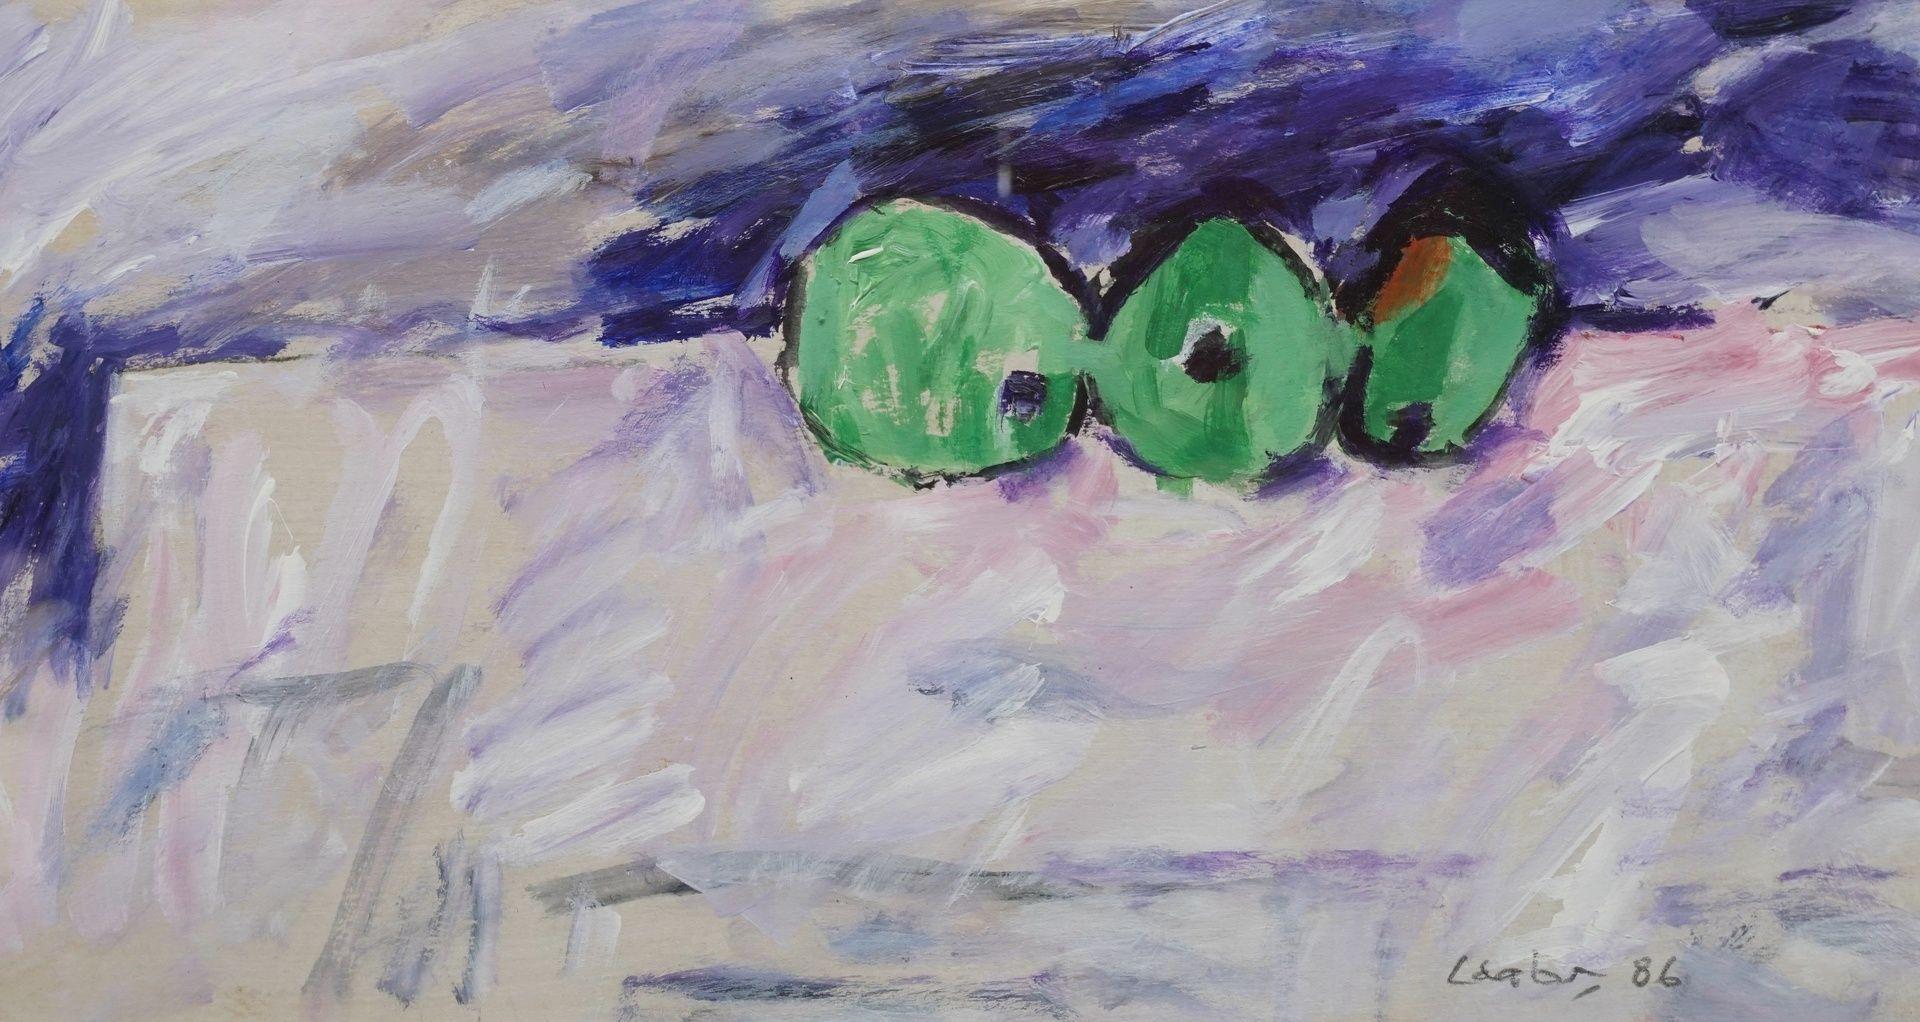 Hans Laabs, Drei grüne Äpfel